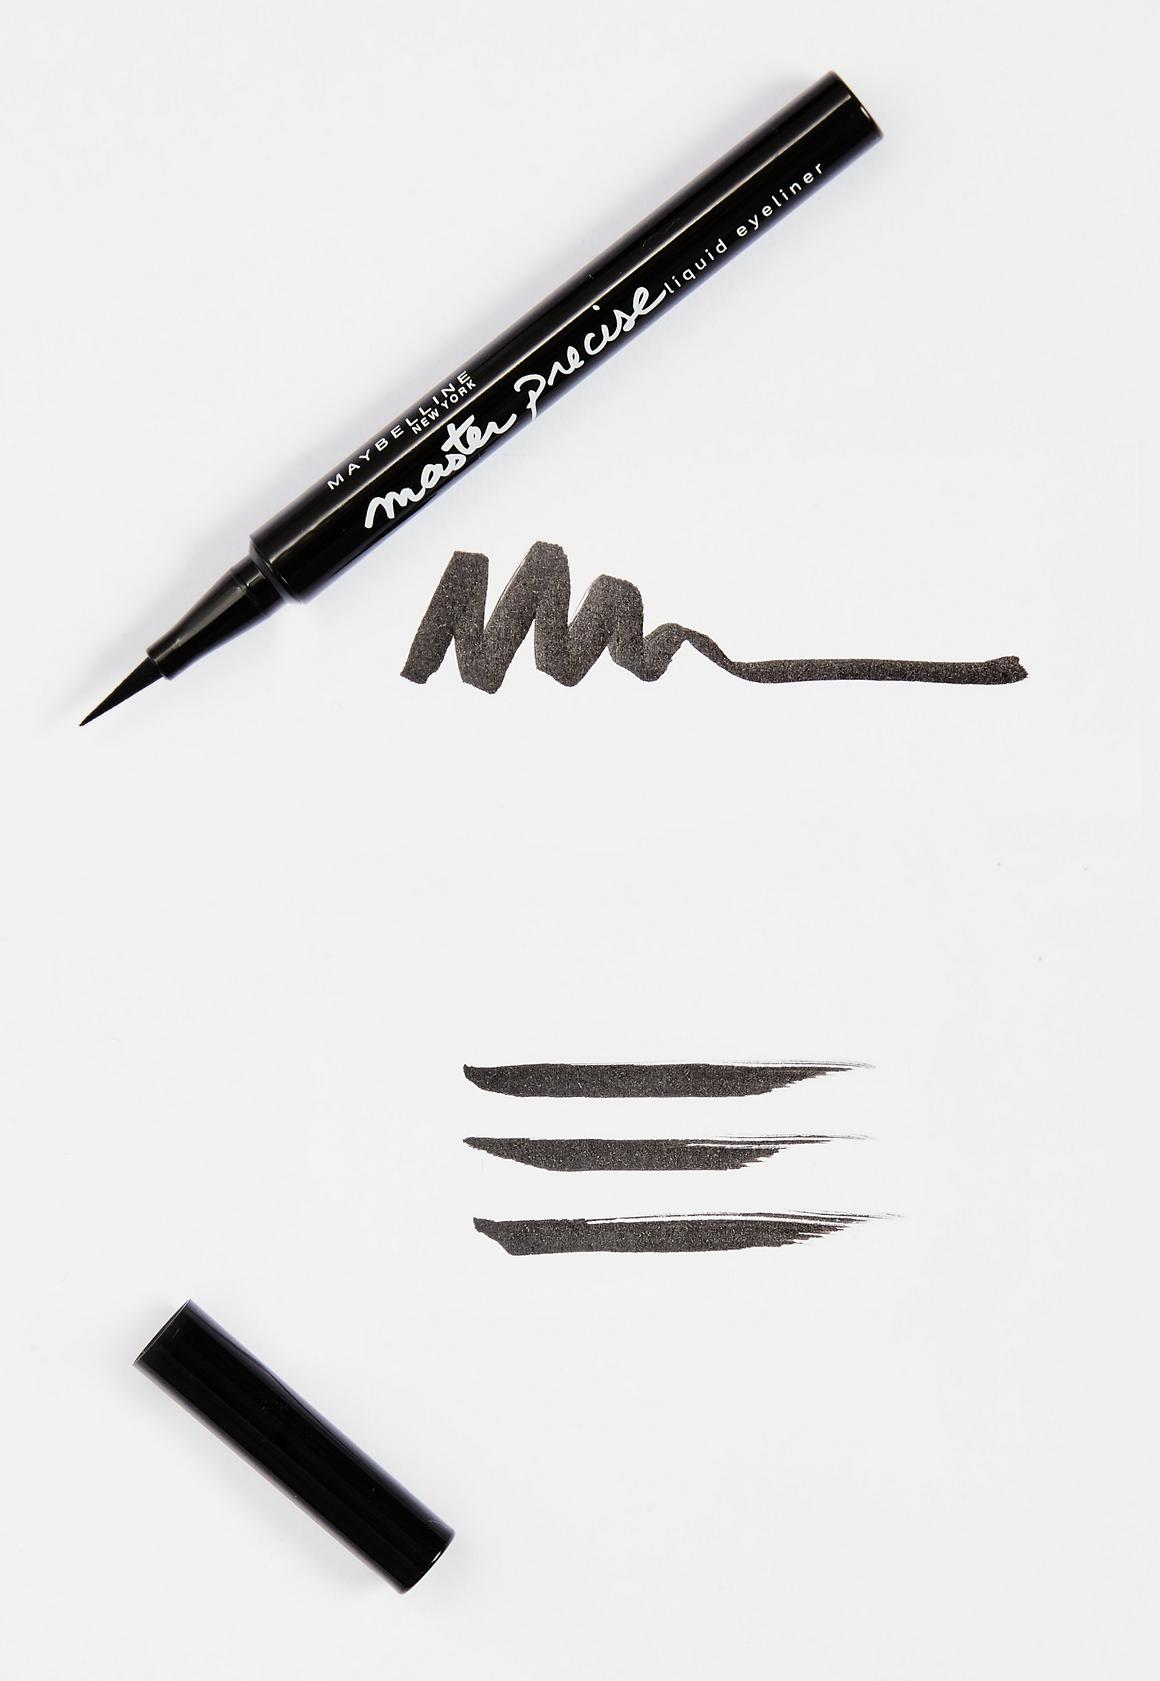 Missguided - Liner feutre Maybelline Master Precise noir - 3